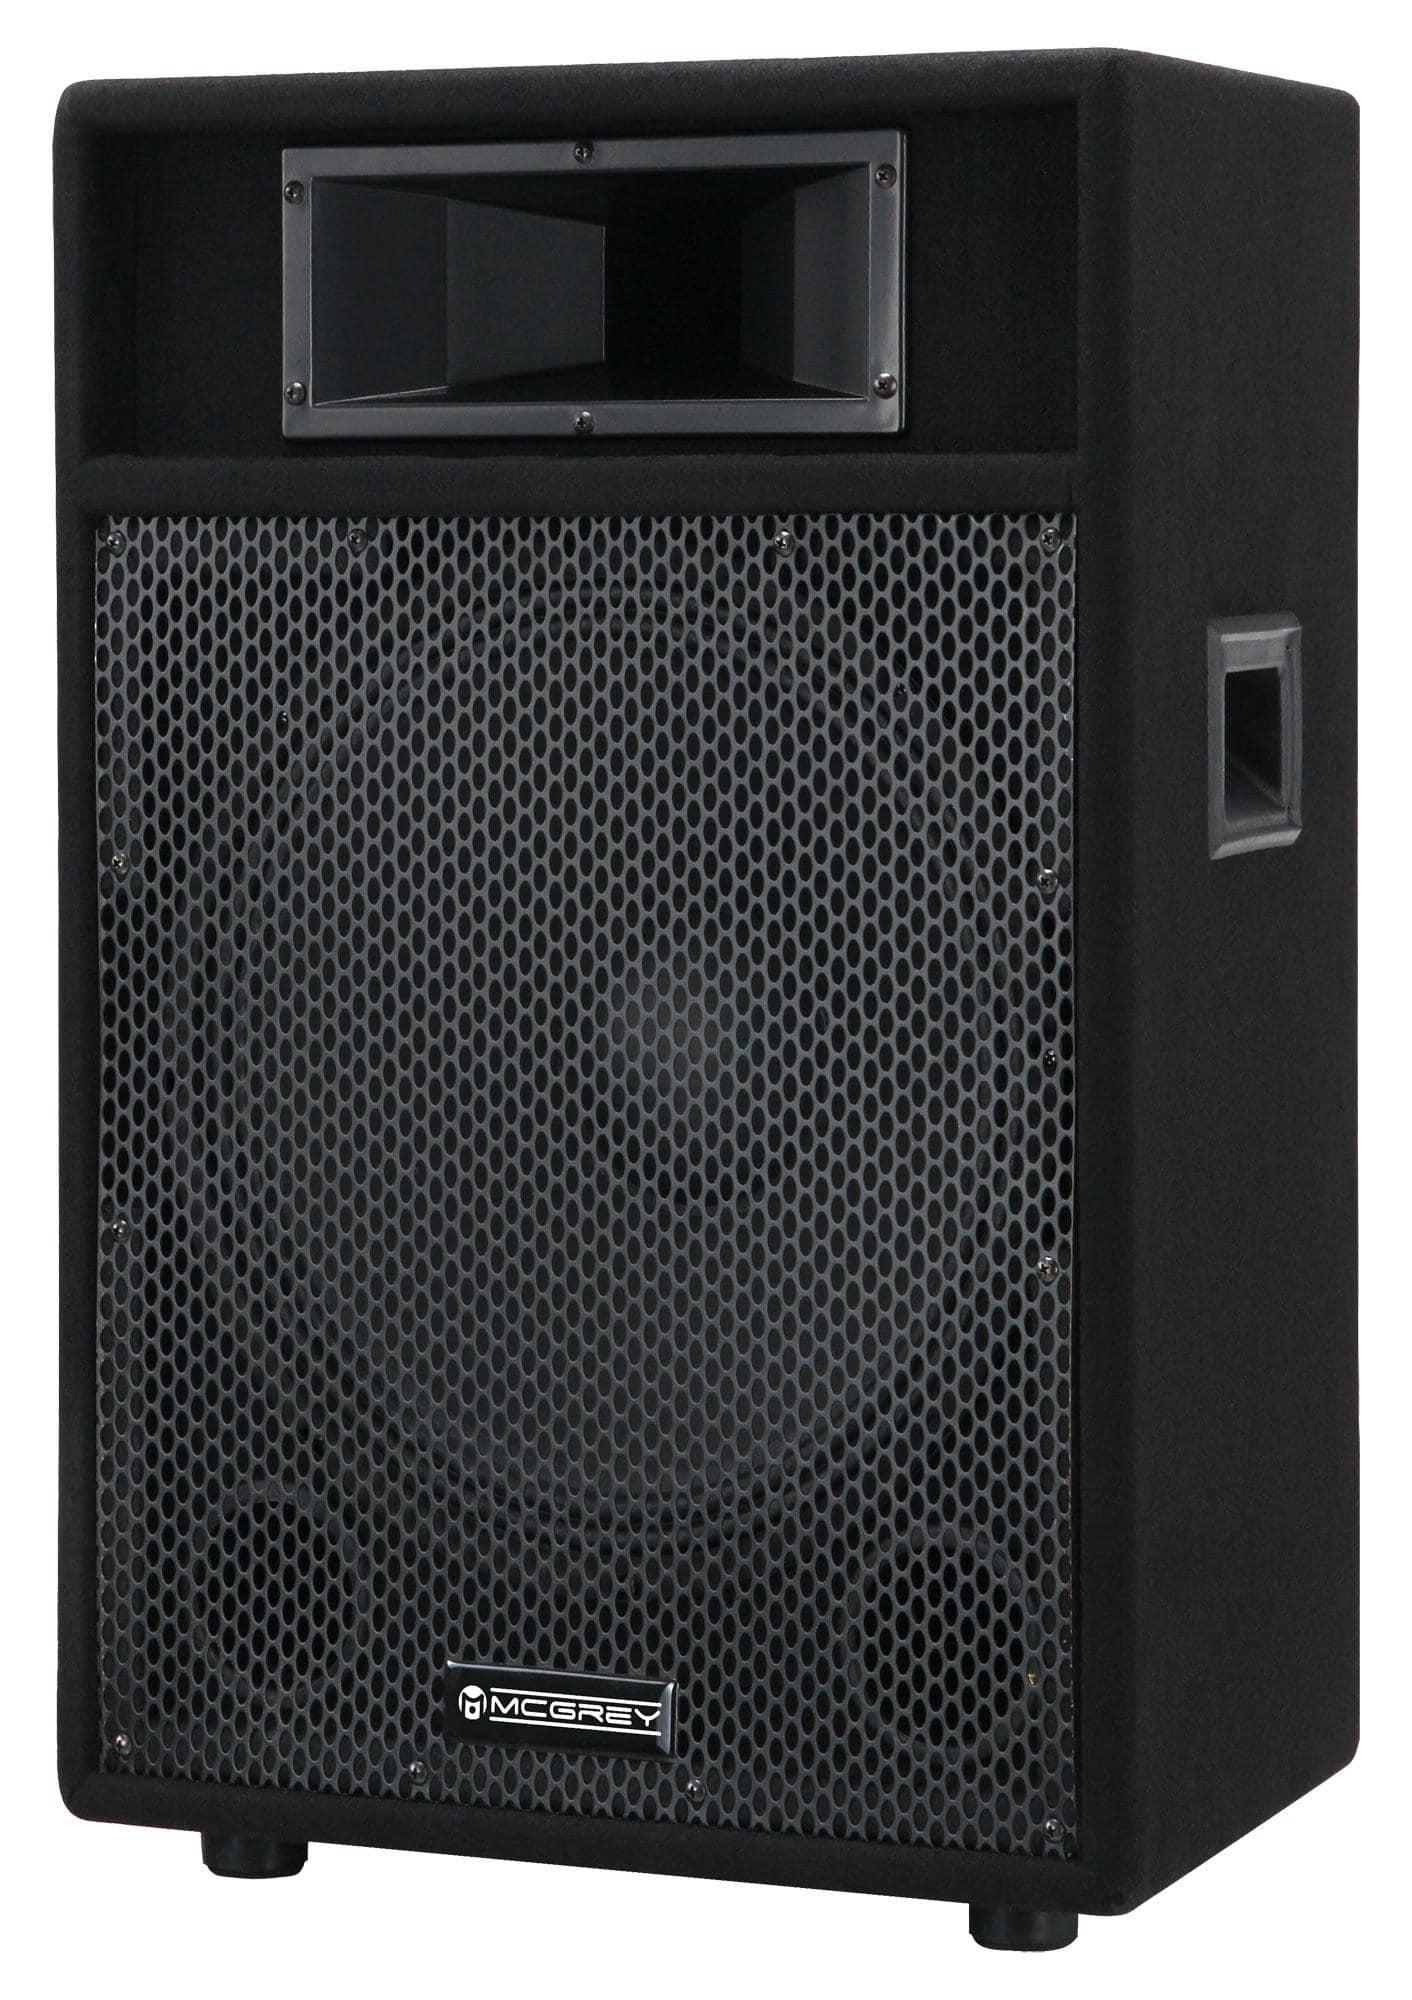 Paboxen - McGrey PA 115 passive PA Lautsprecher Box 400 Watt - Onlineshop Musikhaus Kirstein